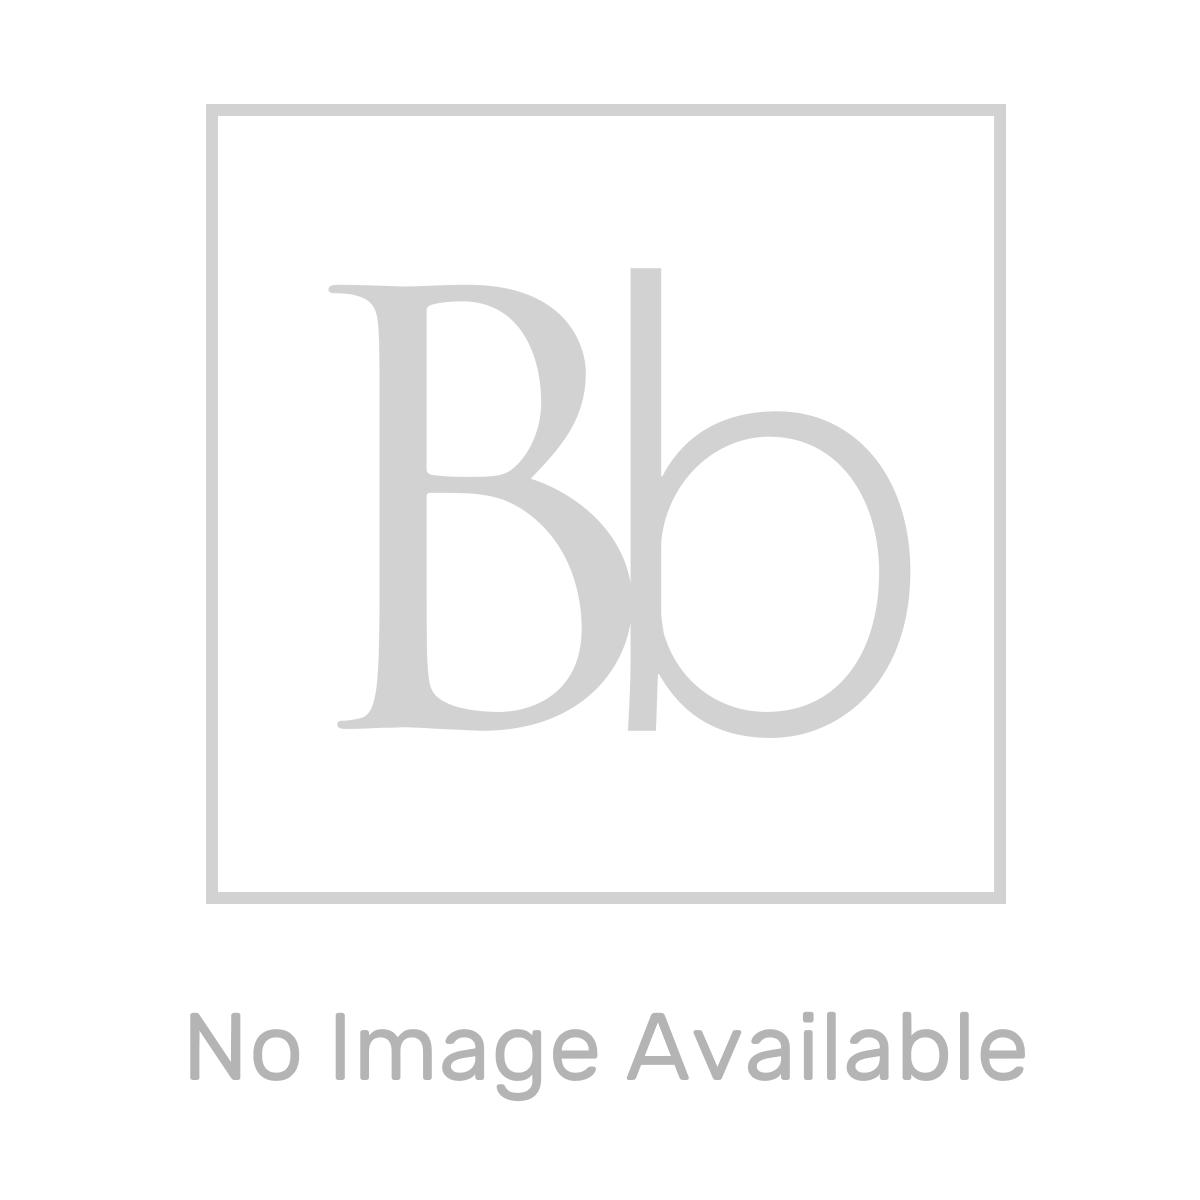 Premier Wet Room Shower Enclosure with Optional Side Panel Dimensions